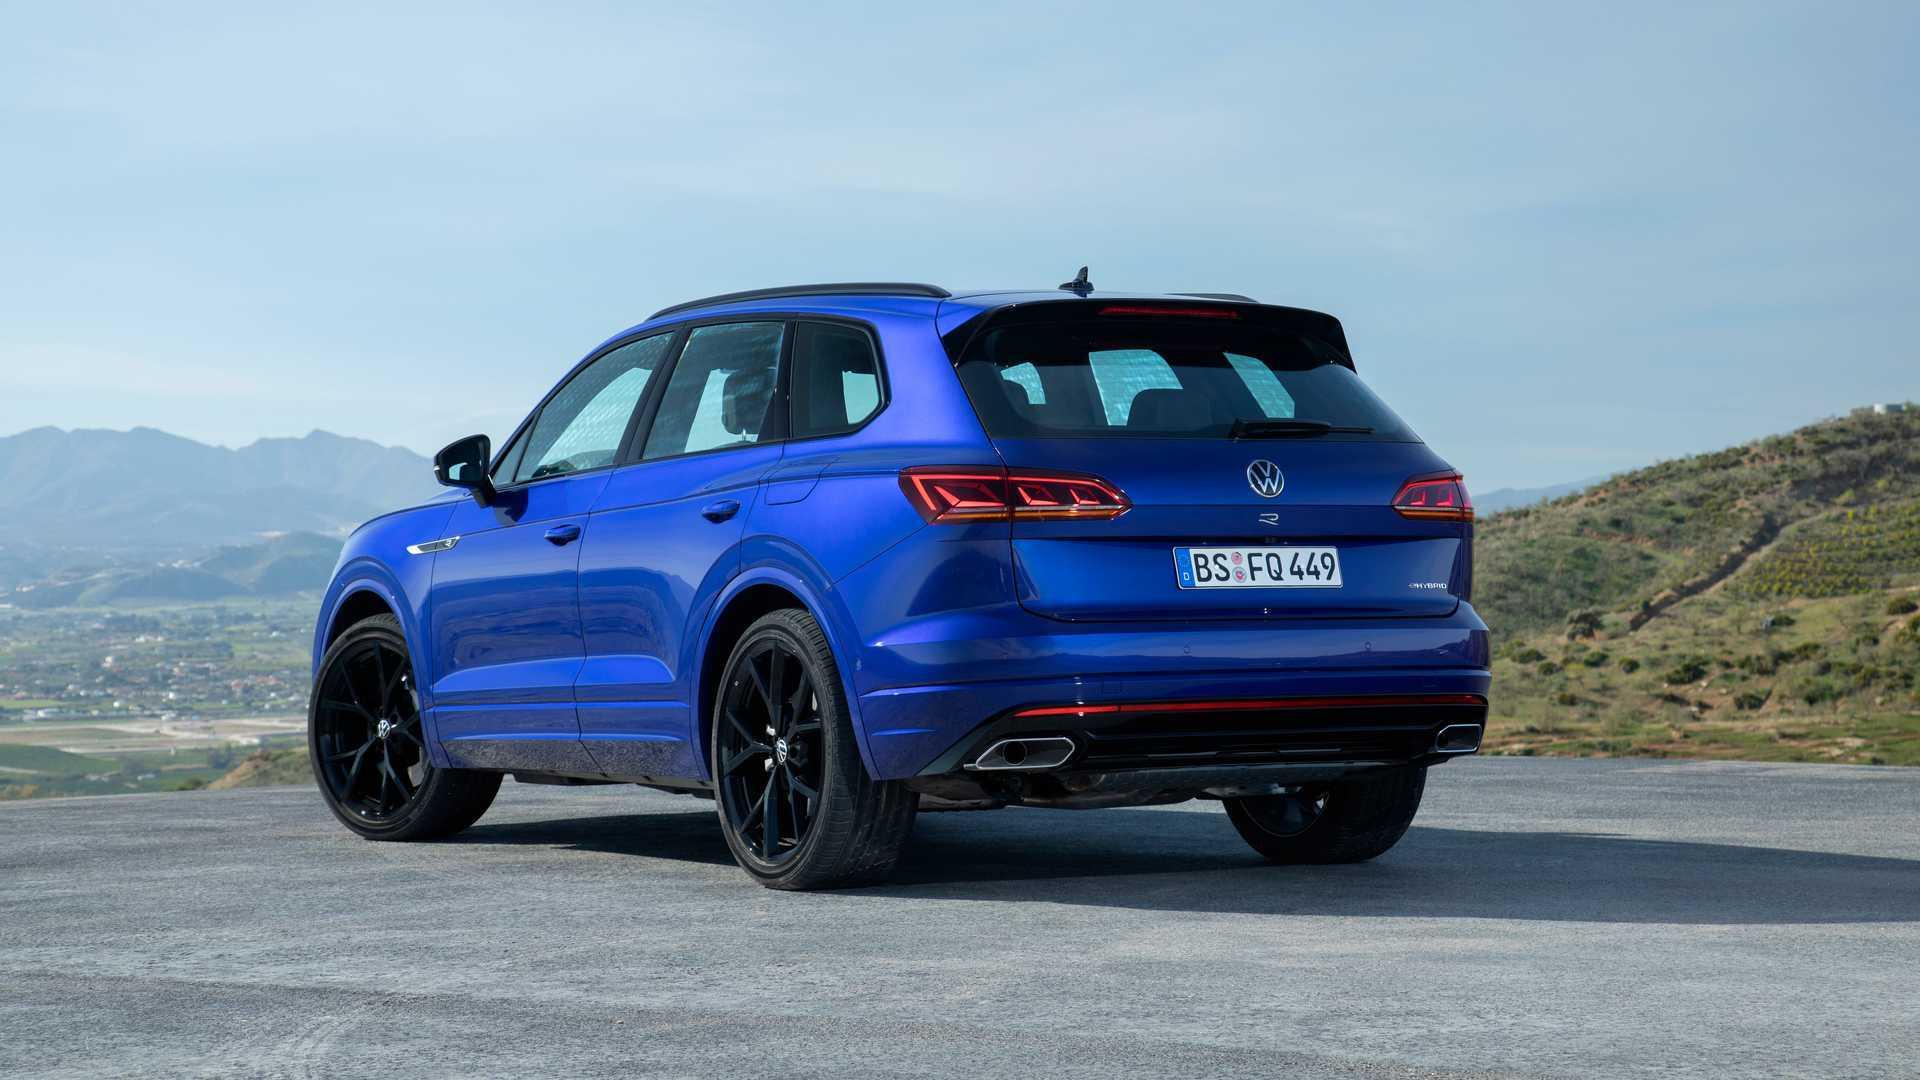 Volkswagen Touareg R способен преодолевать на электротяге до 48 км